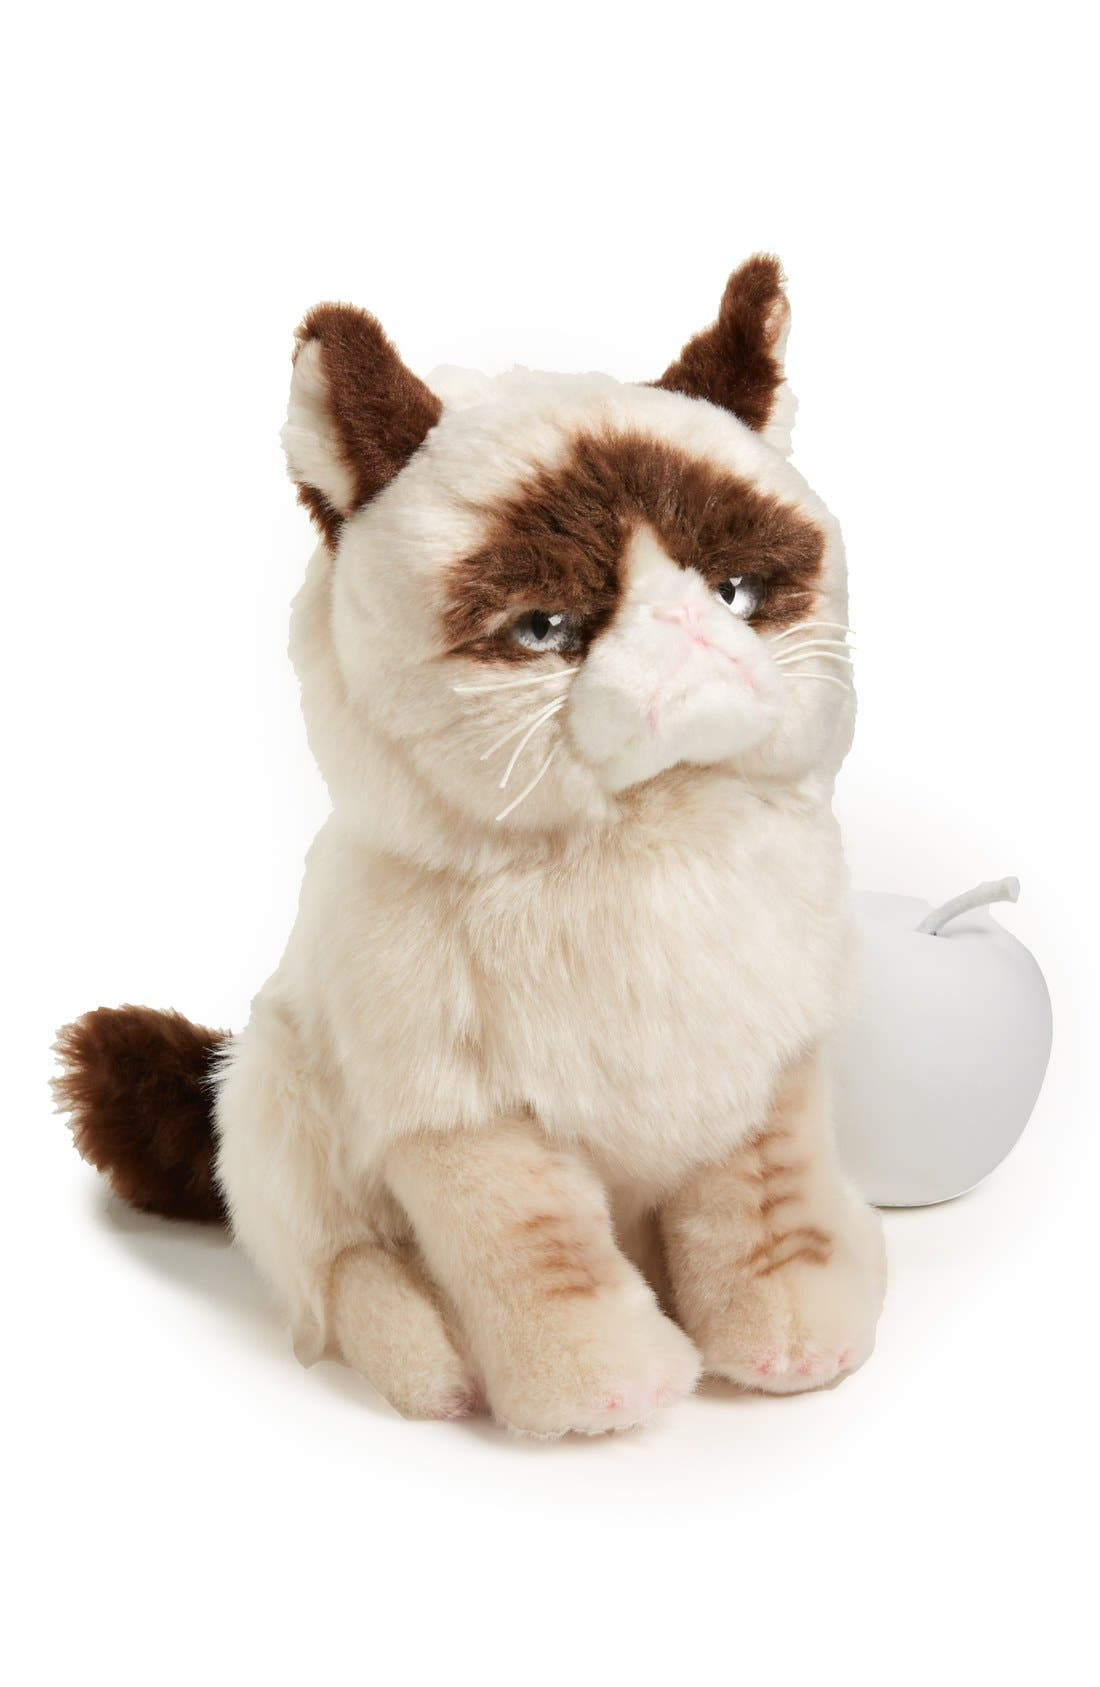 Alternate Image 1 Selected - Gund 'Grumpy Cat' Stuffed Animal